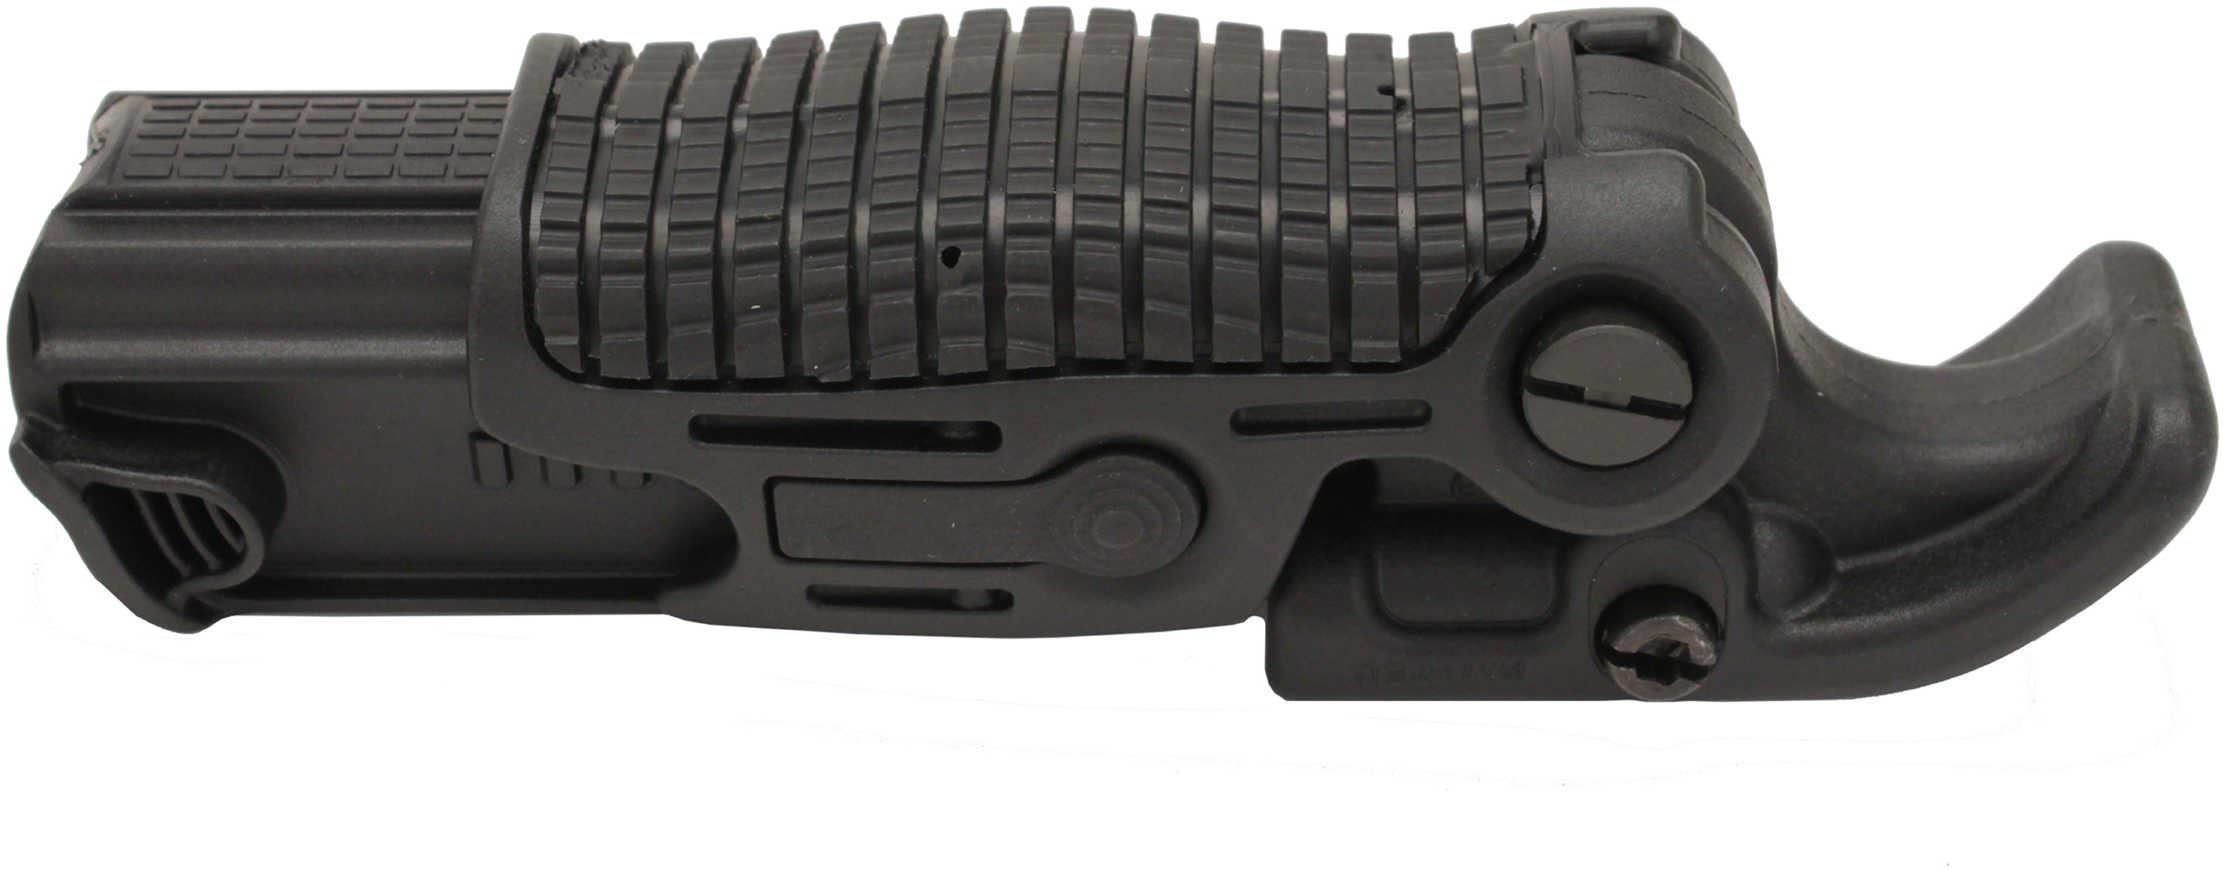 Mako Group Tactical Folding Grip for Glock Handguns Black FGG-K-B